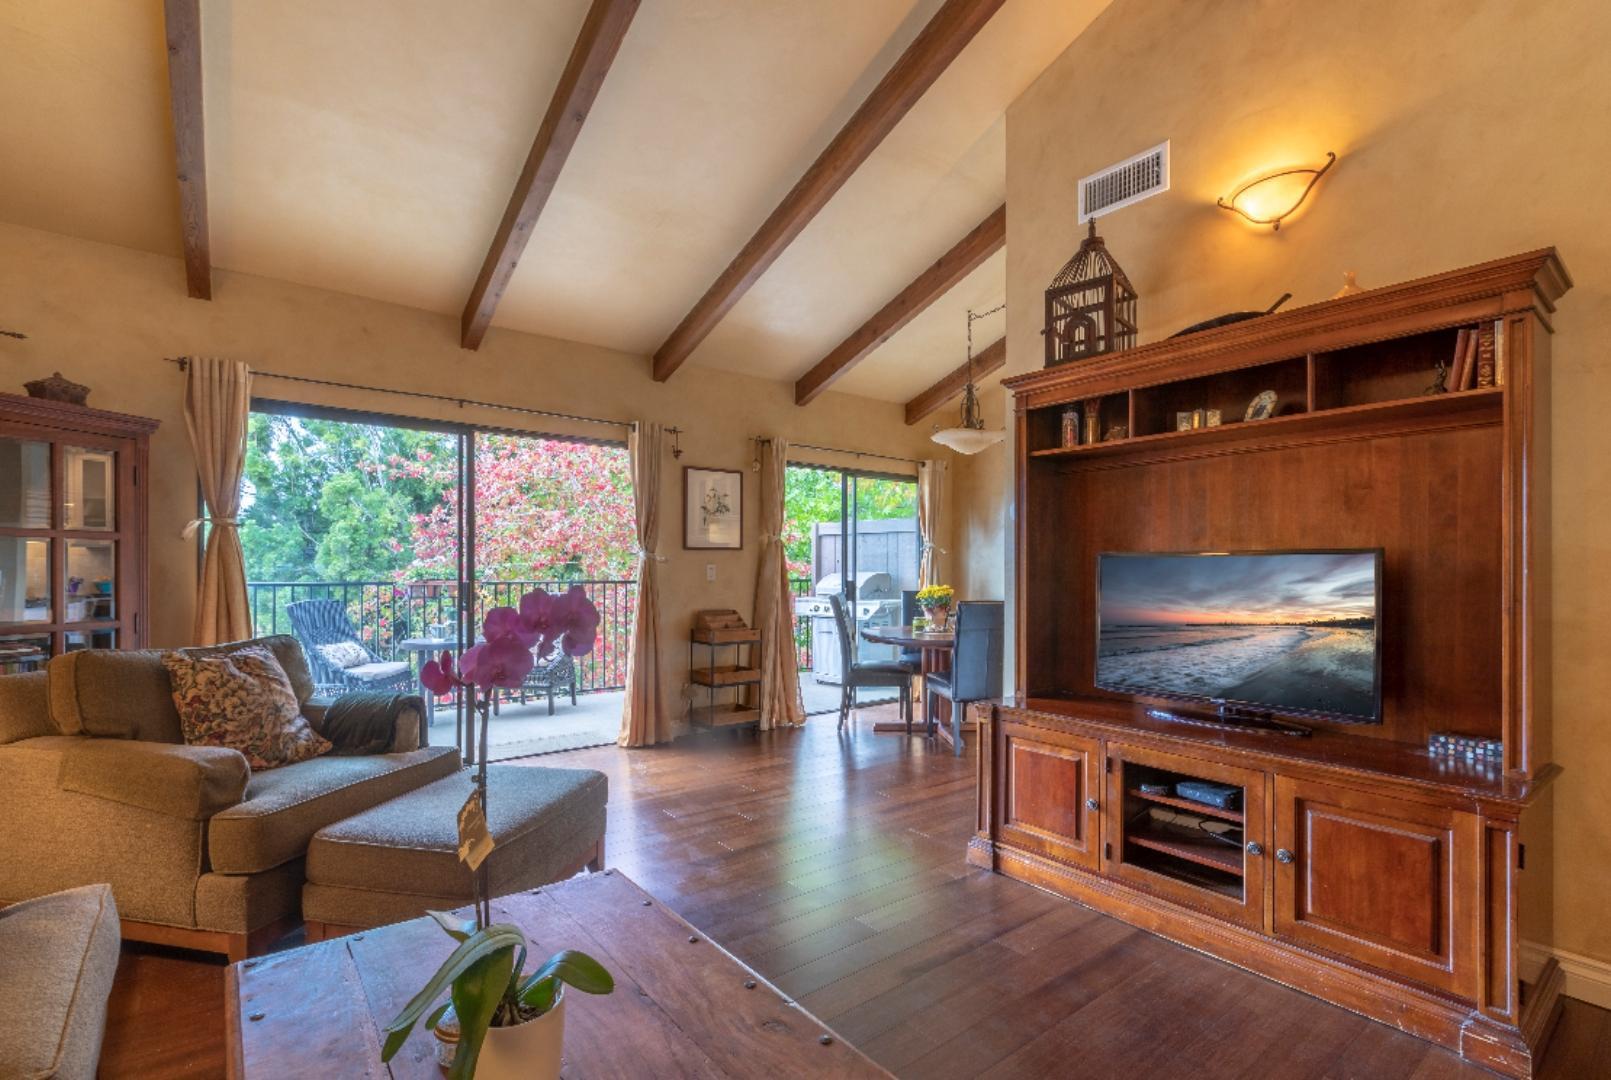 980  Miramonte Dr, Santa Barbara, California